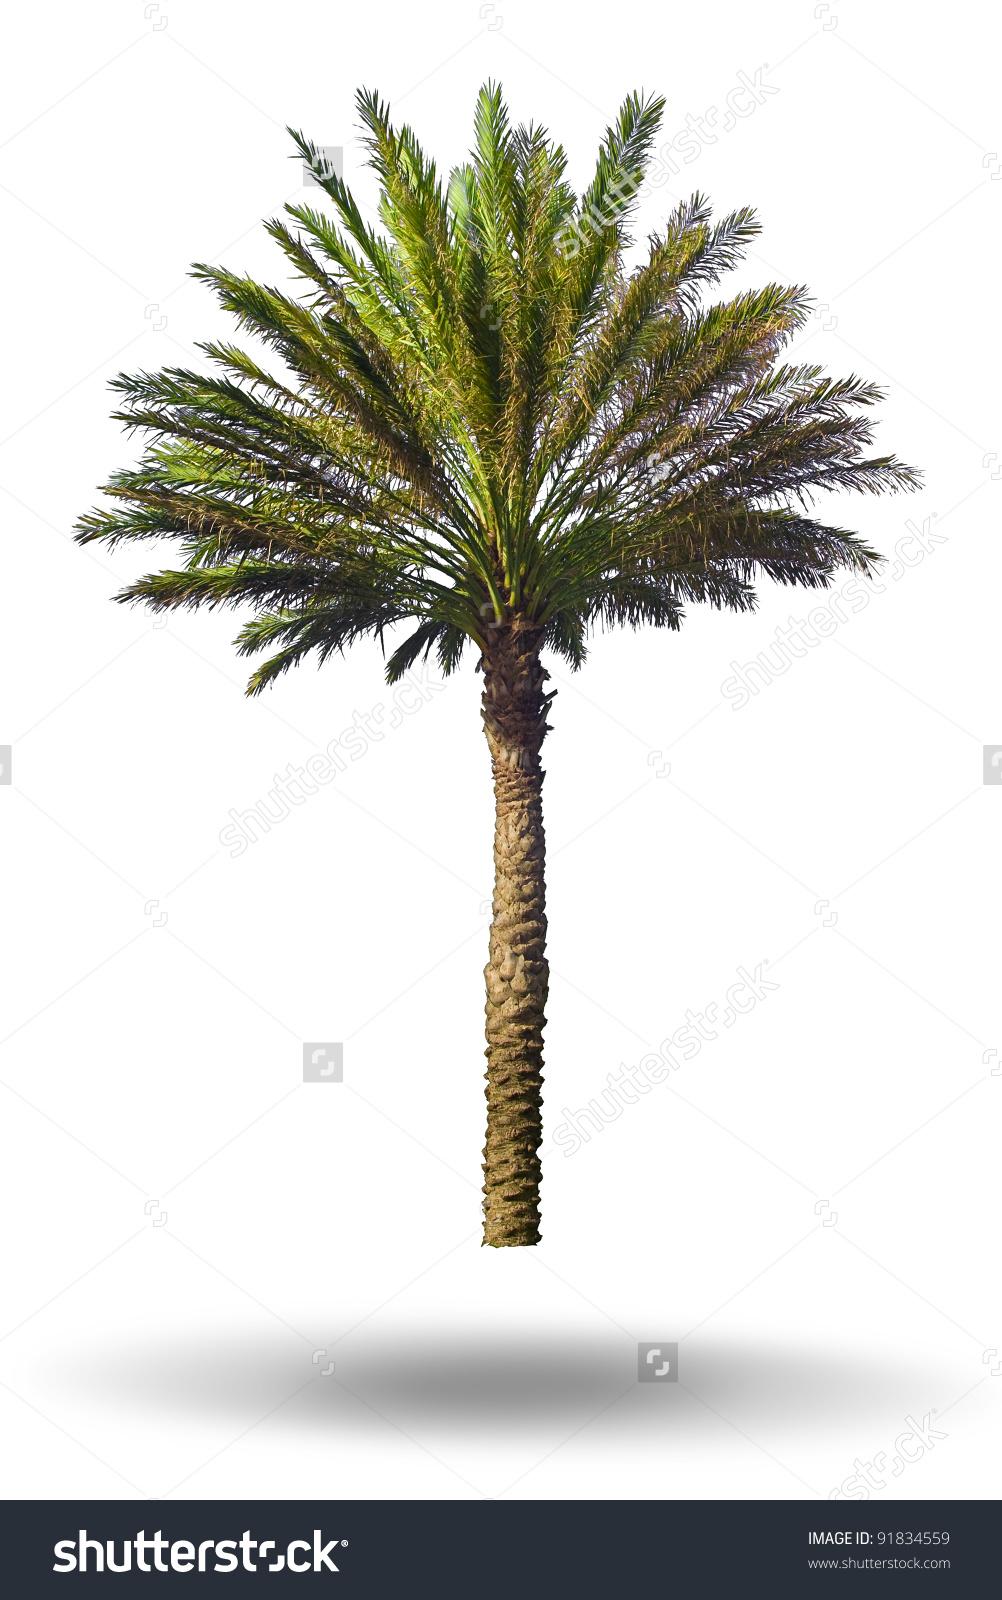 Palm Tree Isolated On White Background Stock Photo 91834559.